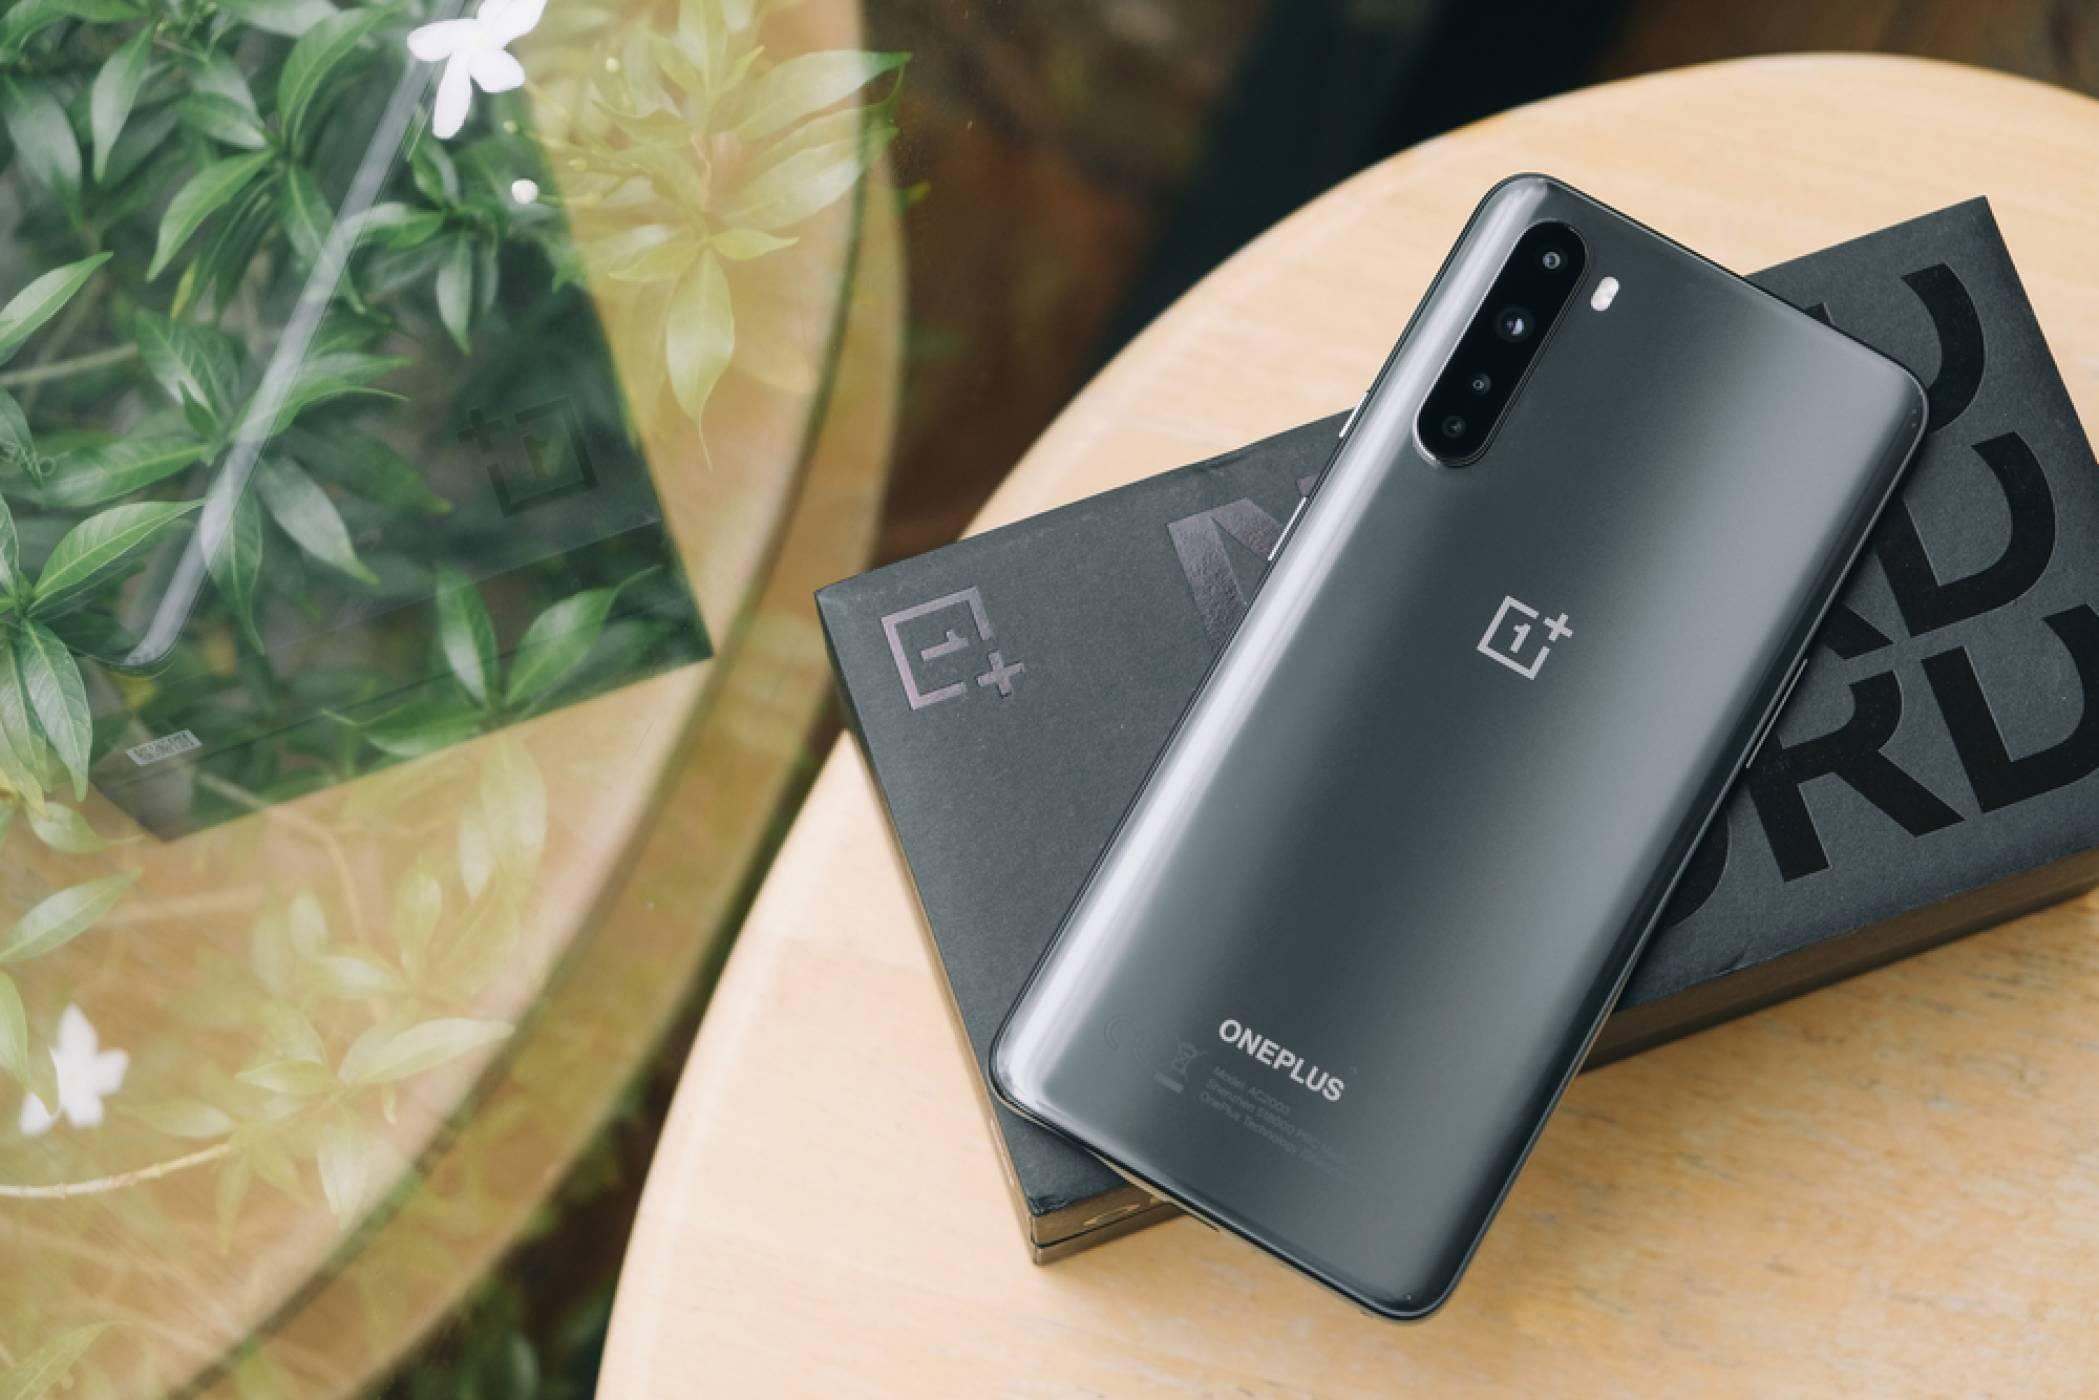 Инсайдер: OnePlus Nord 2 получит тройную камер на 50 МП, аккумулятор на 4500 мАч, чип Dimensity 1200 и до 12 ГБ ОЗУ